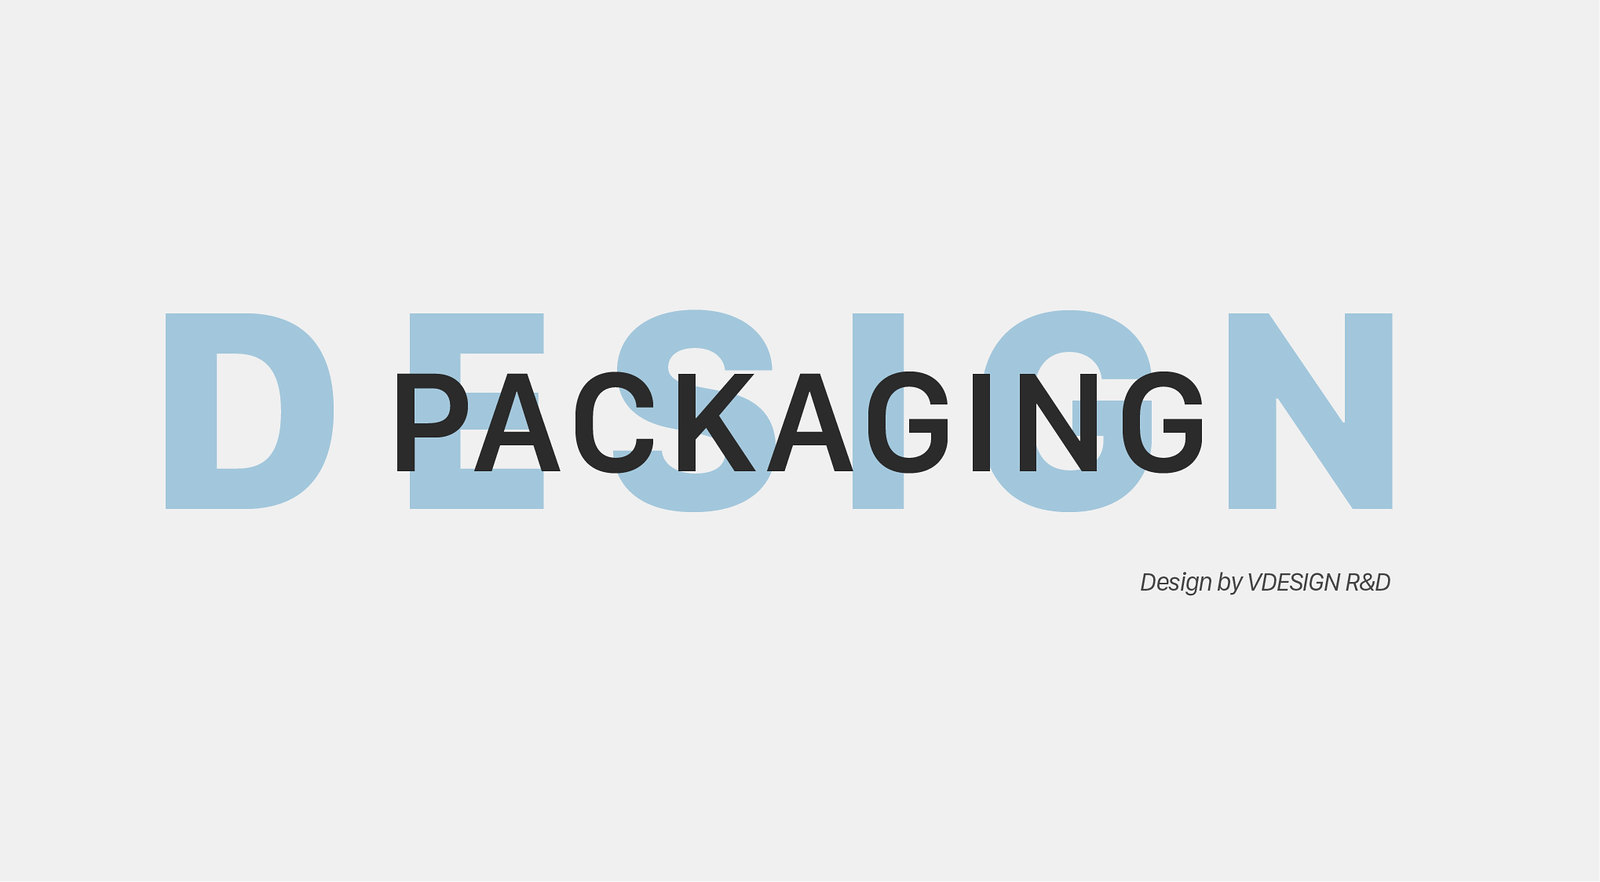 Packaging design - Vdesign R&D